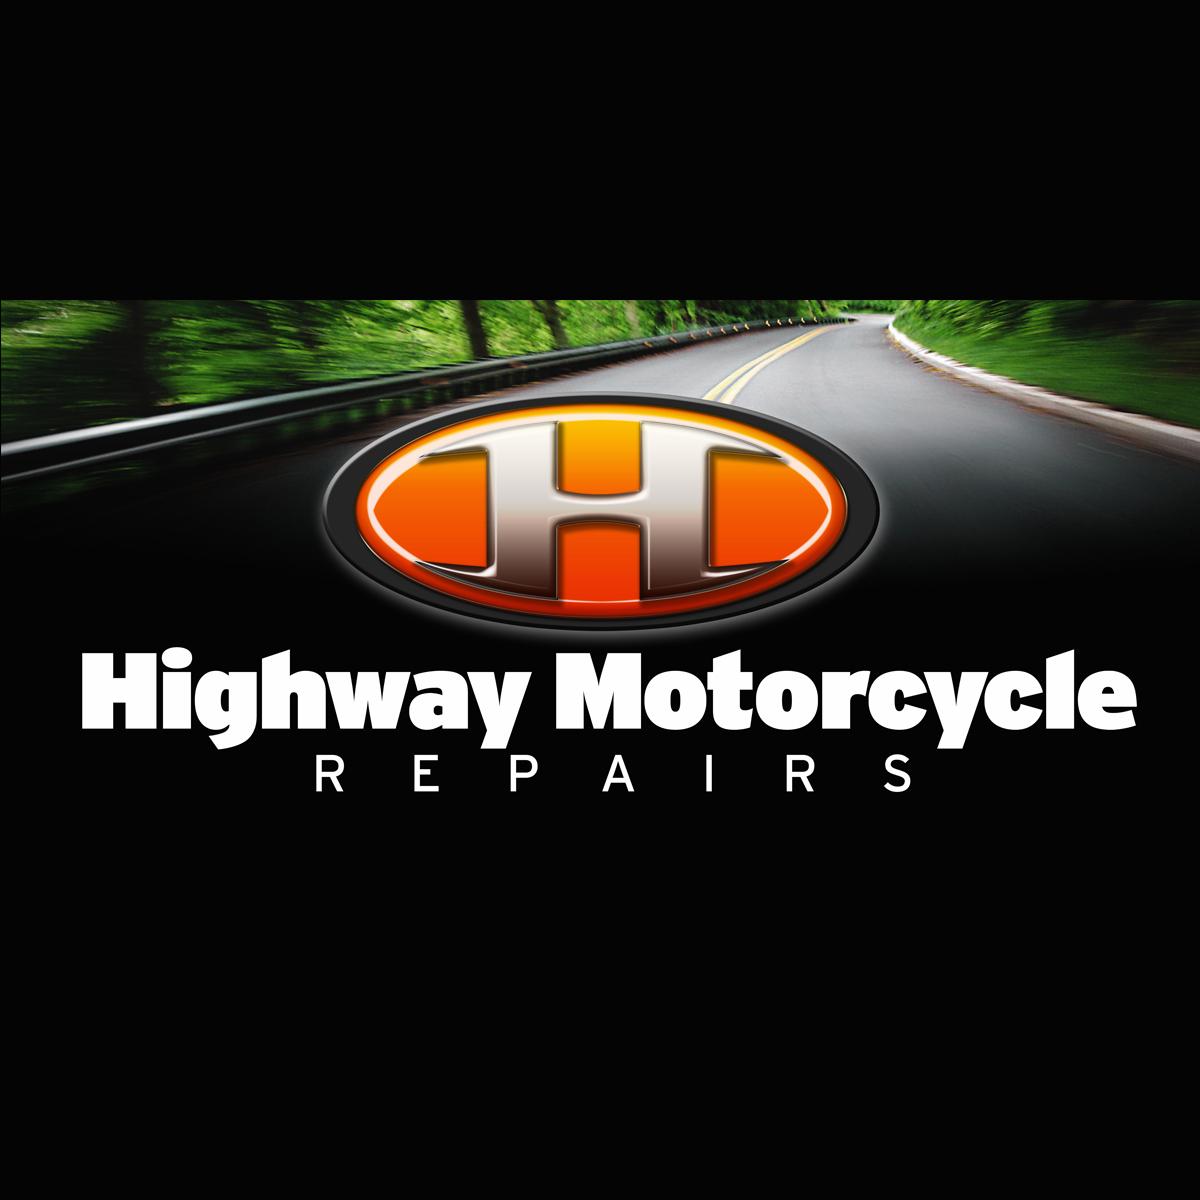 Highway Motorcycles SignMax